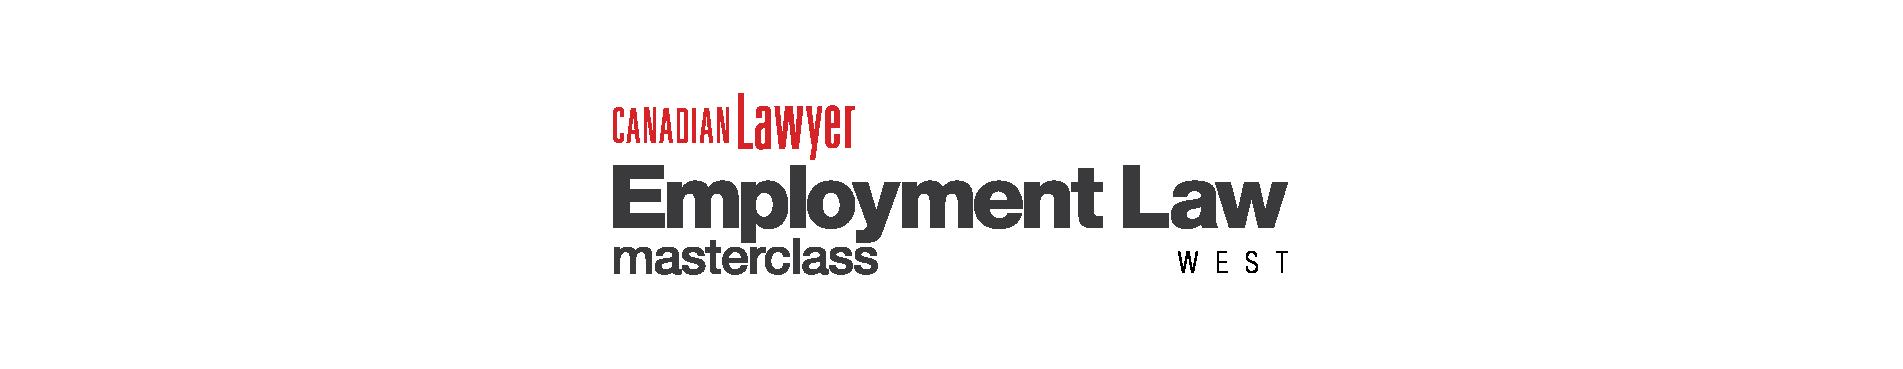 Employment Law West Masterclass